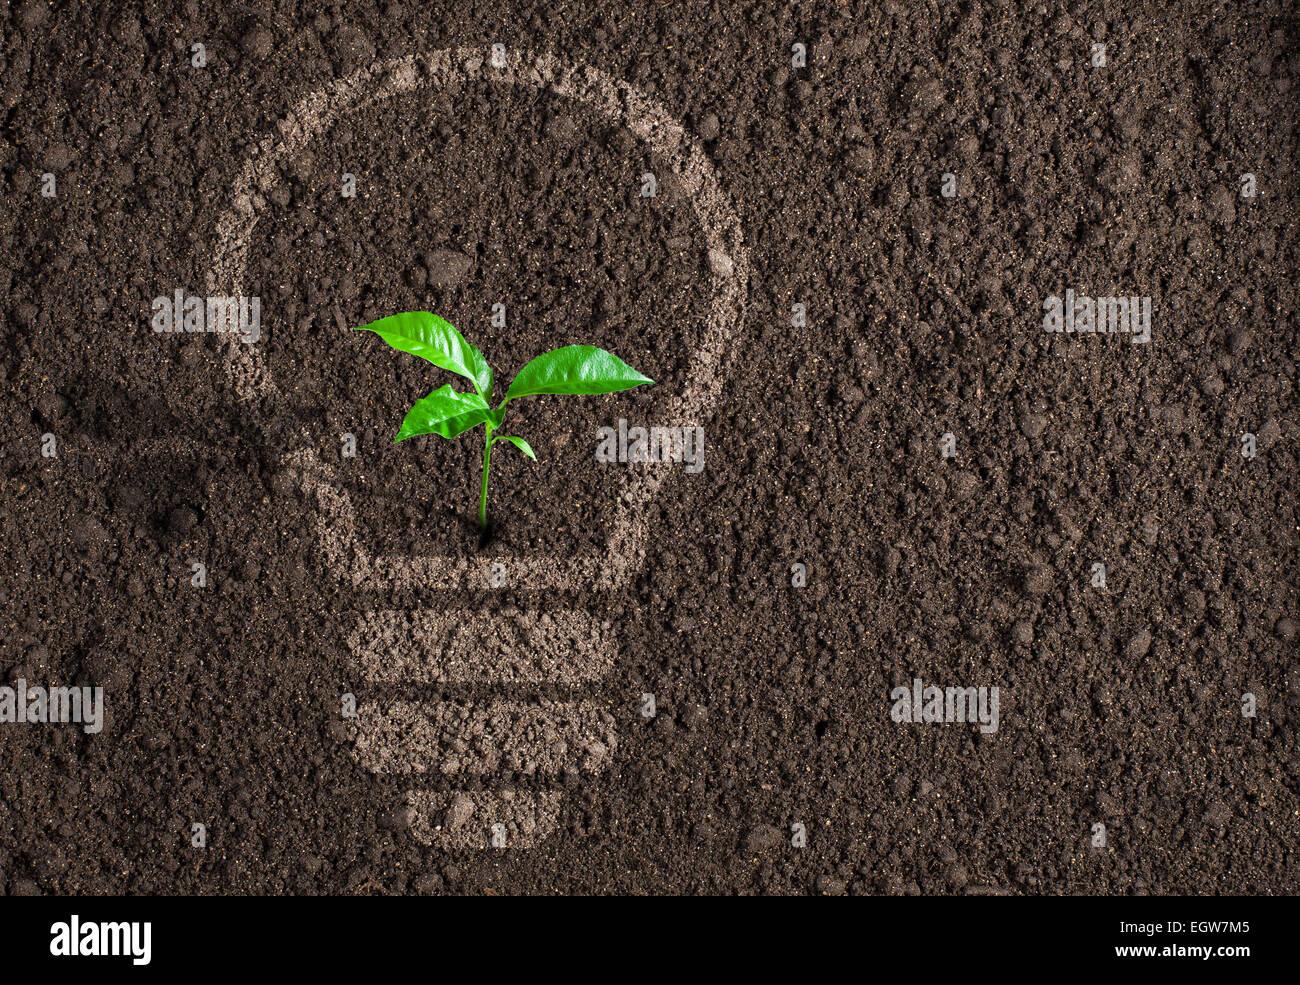 Green plant in light bulb silhouette on soil background - Stock Image